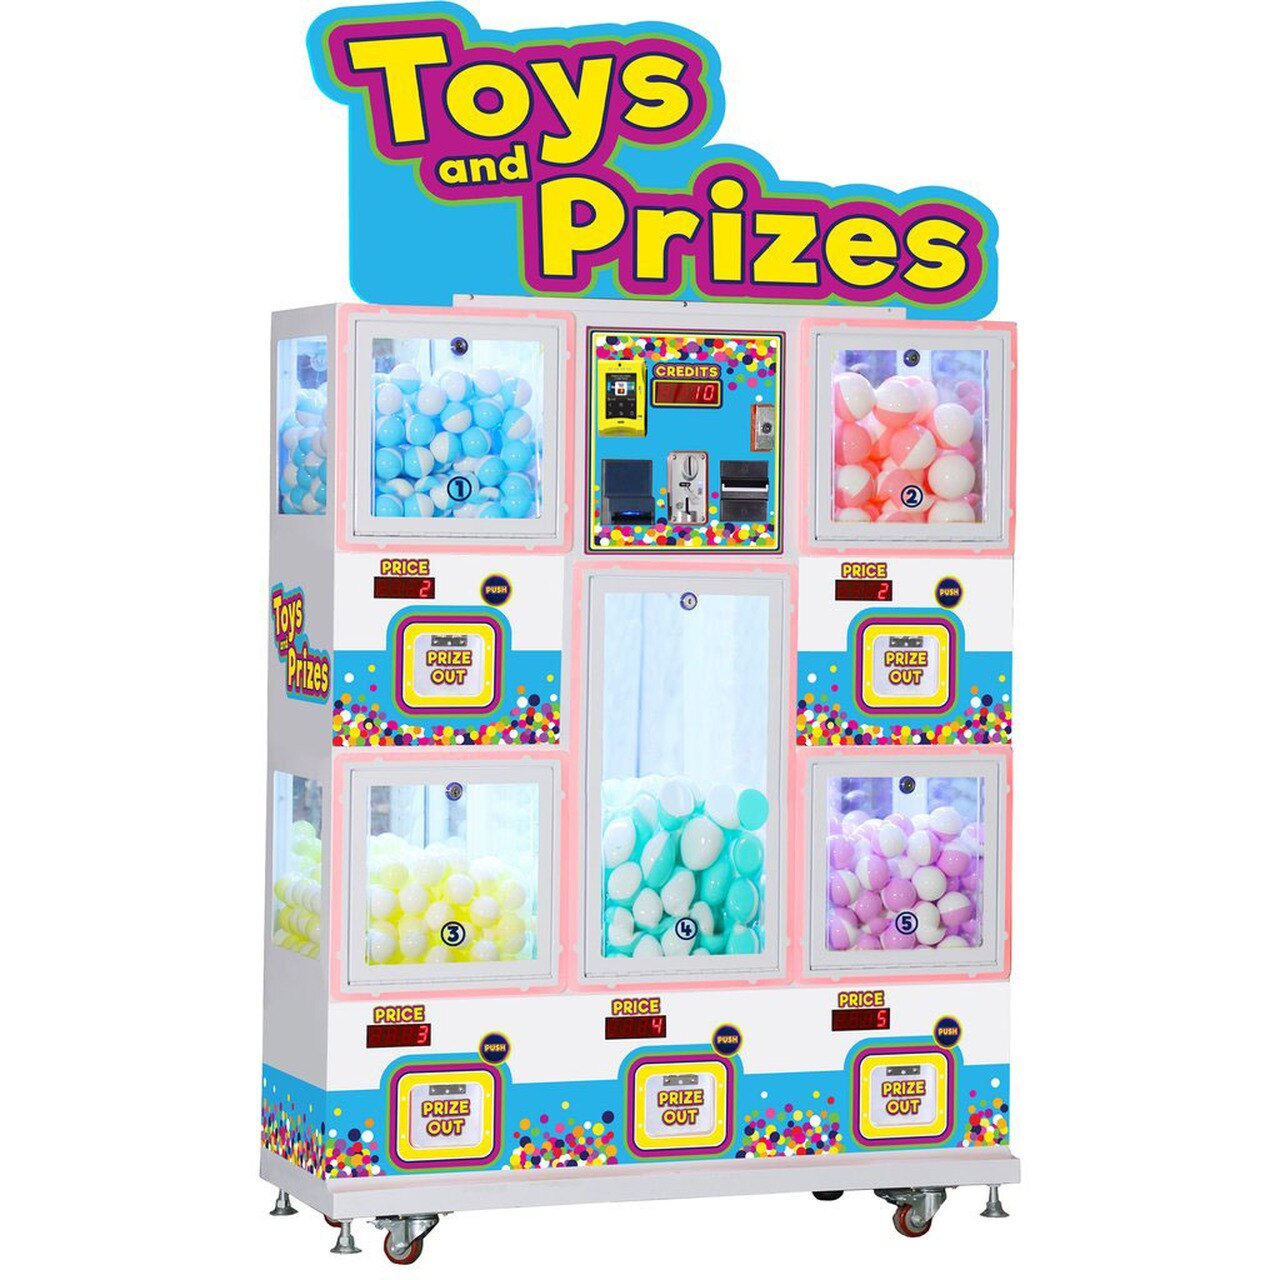 Children's vending machines: Past, present and future